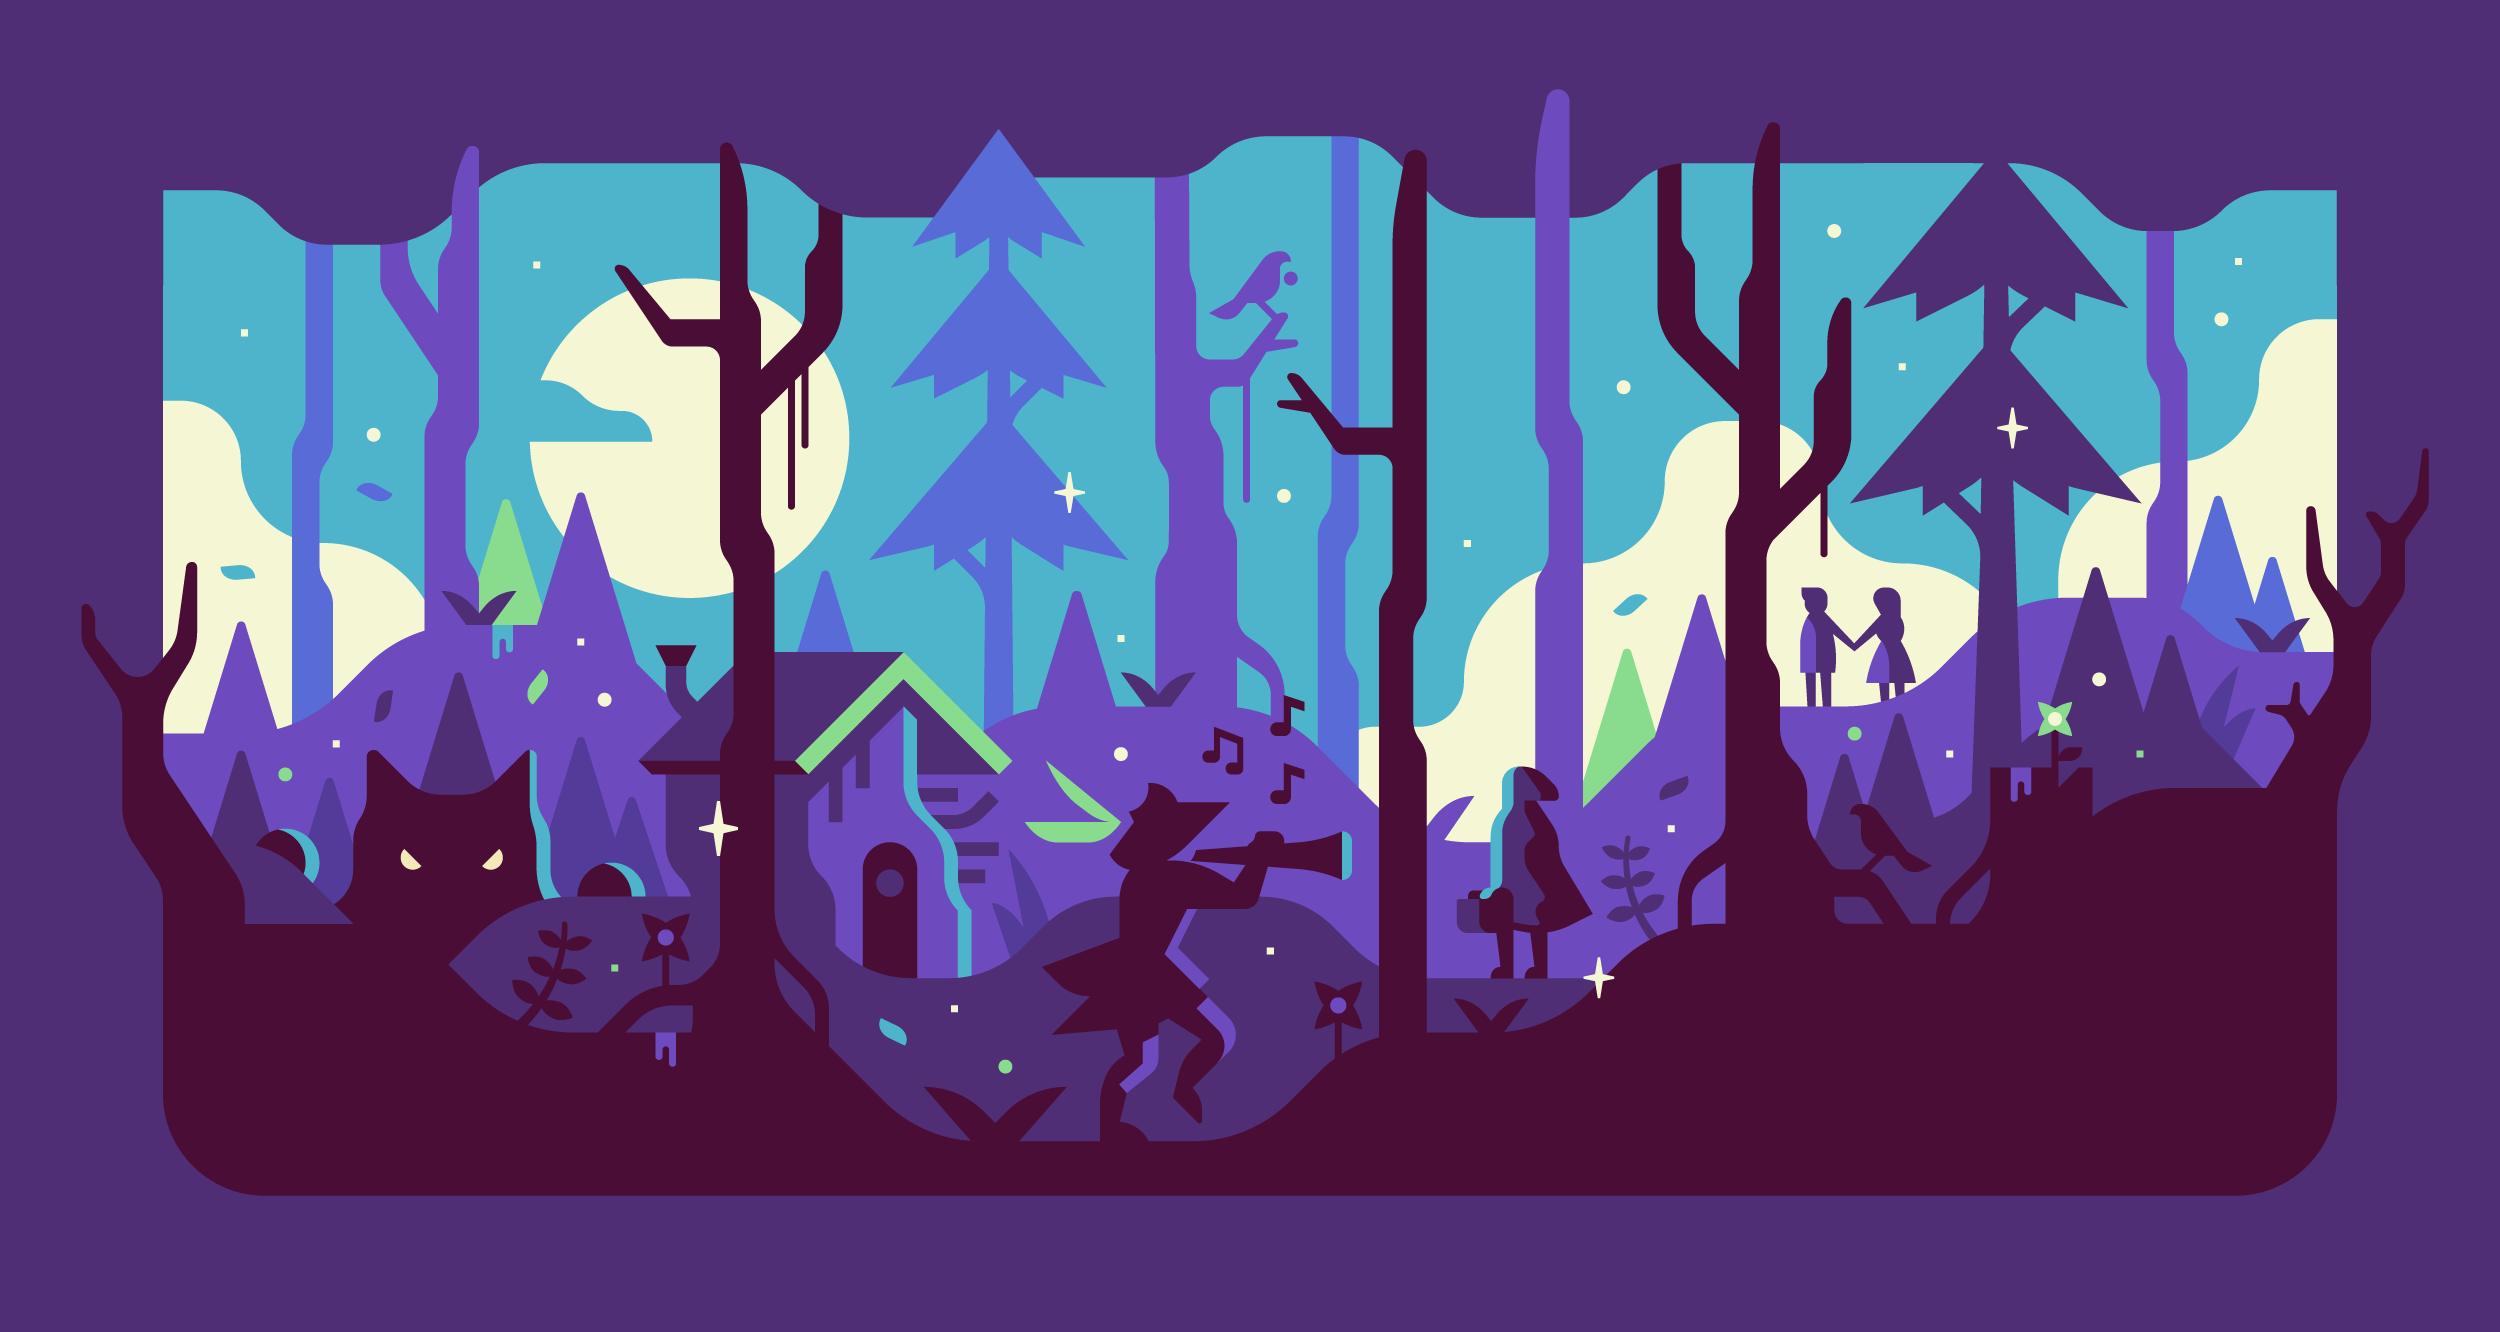 Fandom Dark Fairytales hero illustration. Series by Matt Anderson and Canopy Design and Illustration.